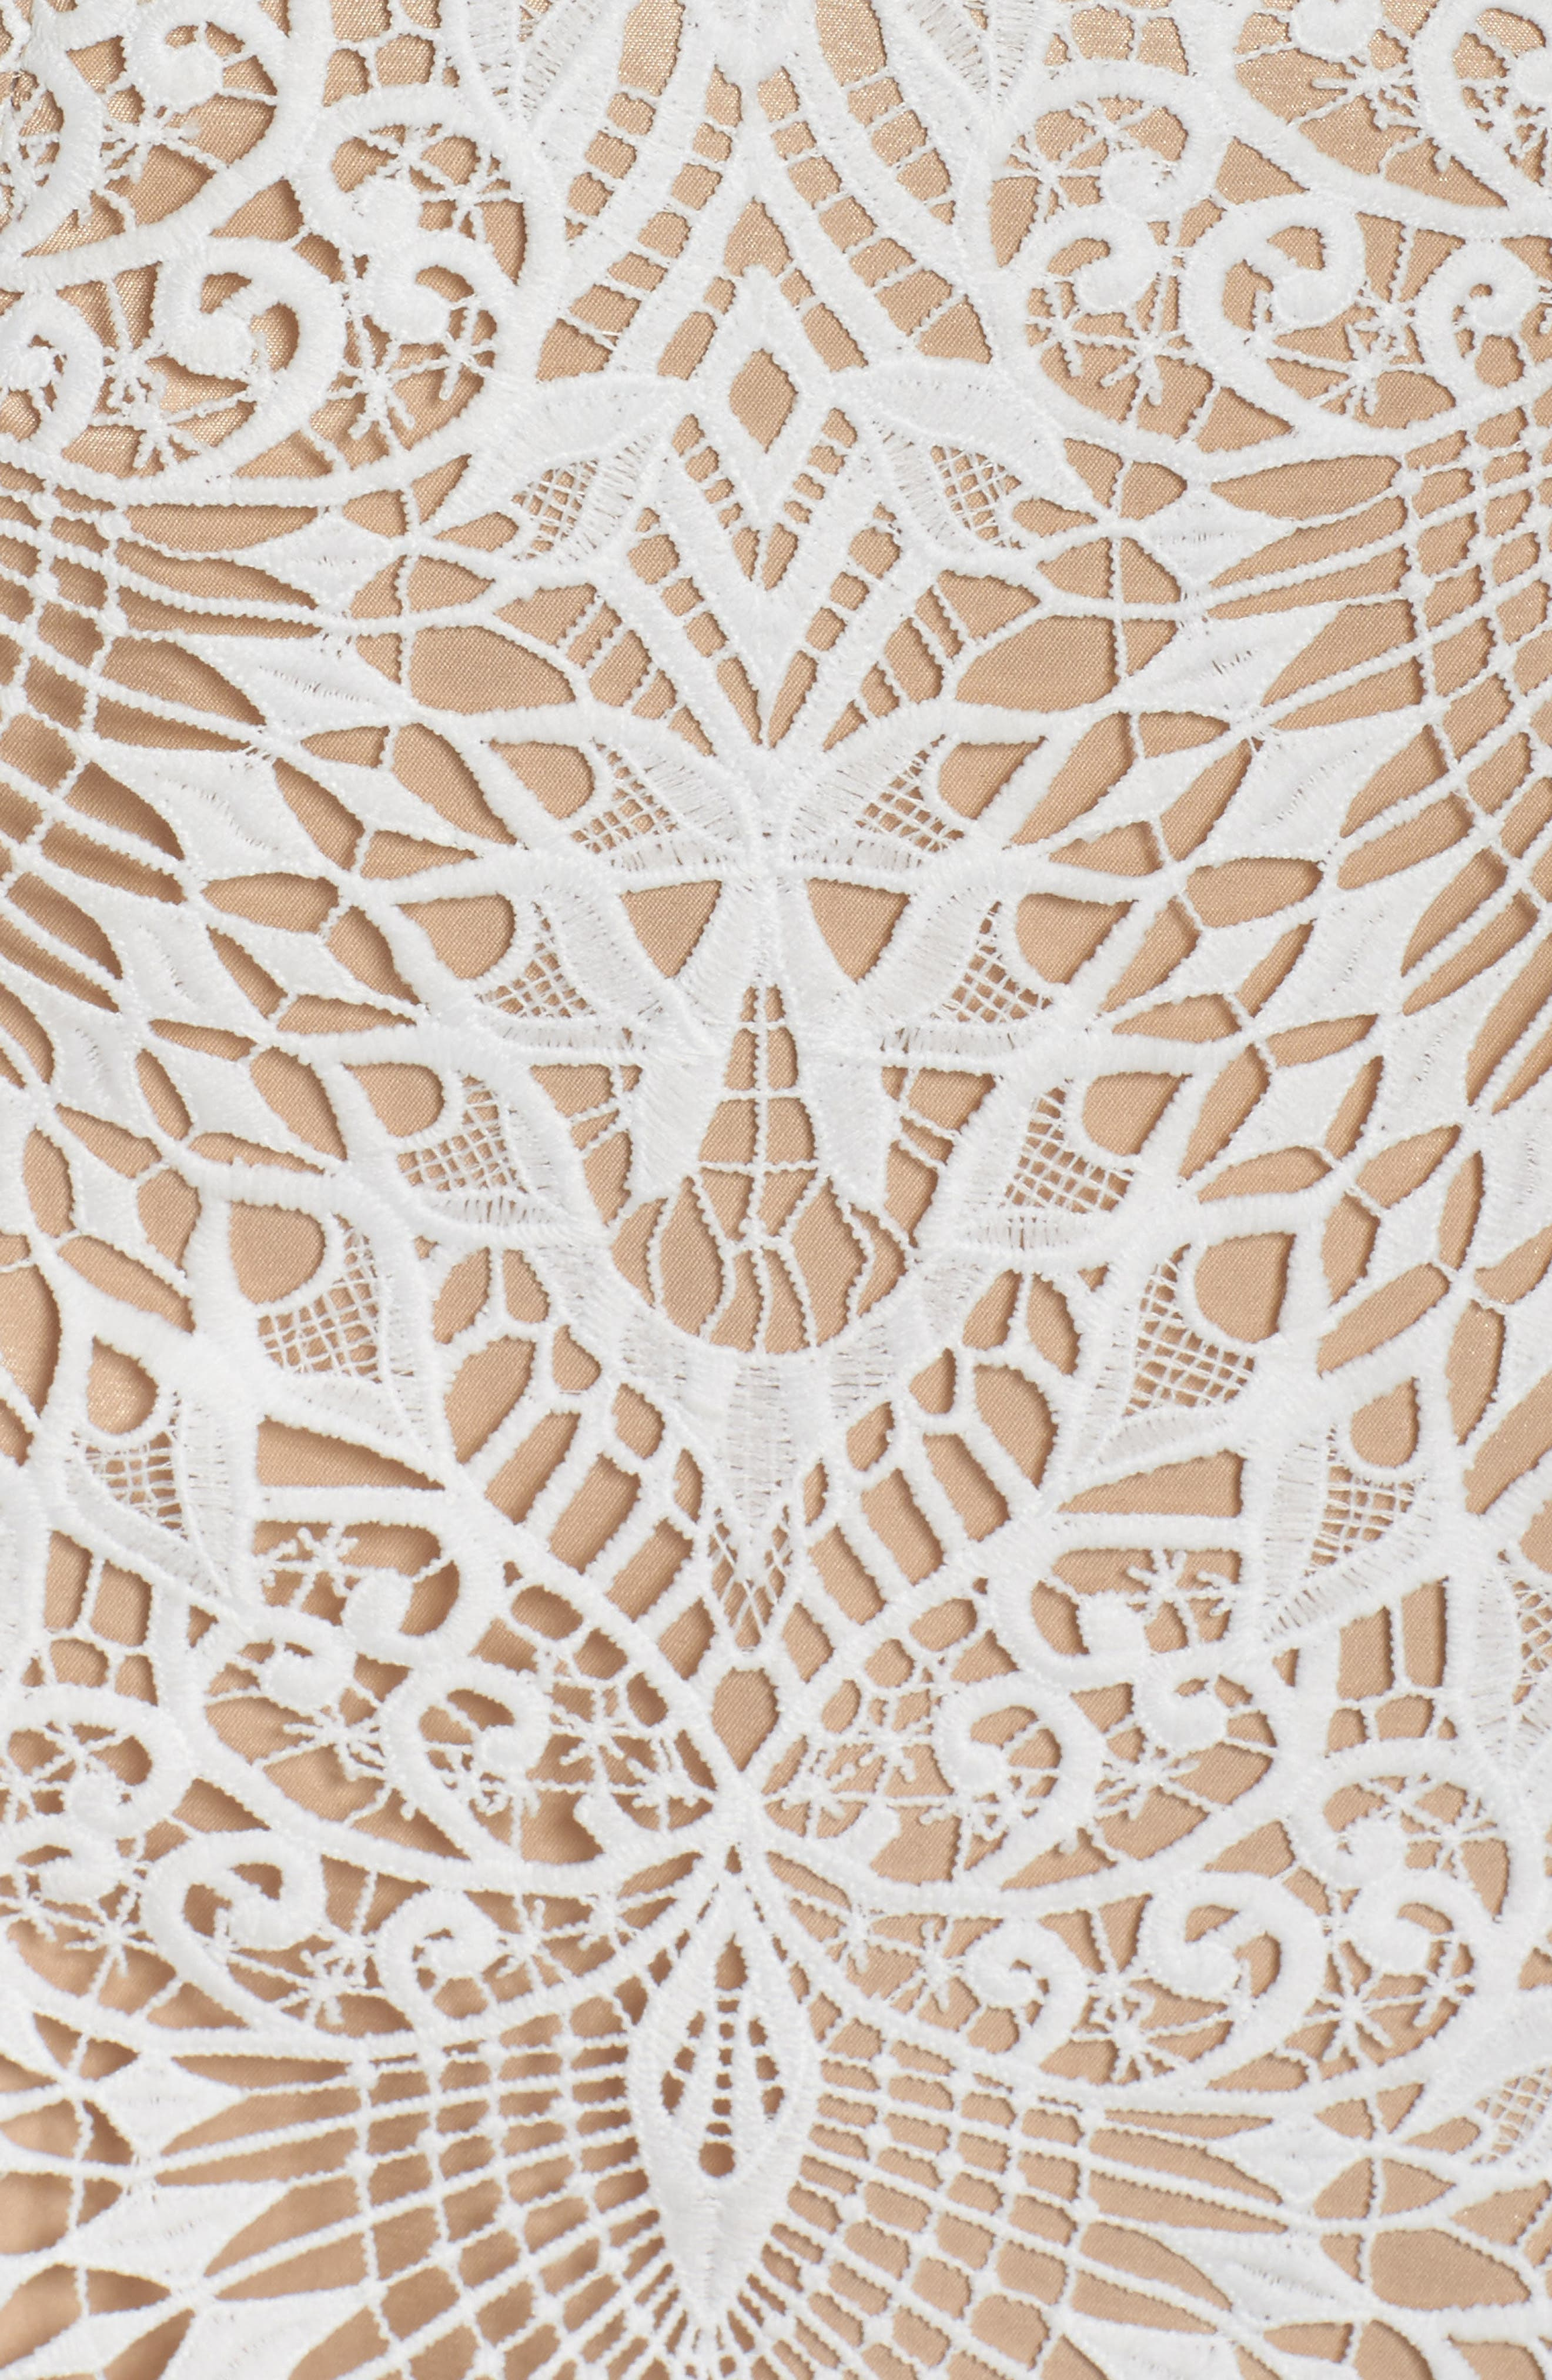 Calypso Lace Sheath Dress,                             Alternate thumbnail 5, color,                             Ivory Nude